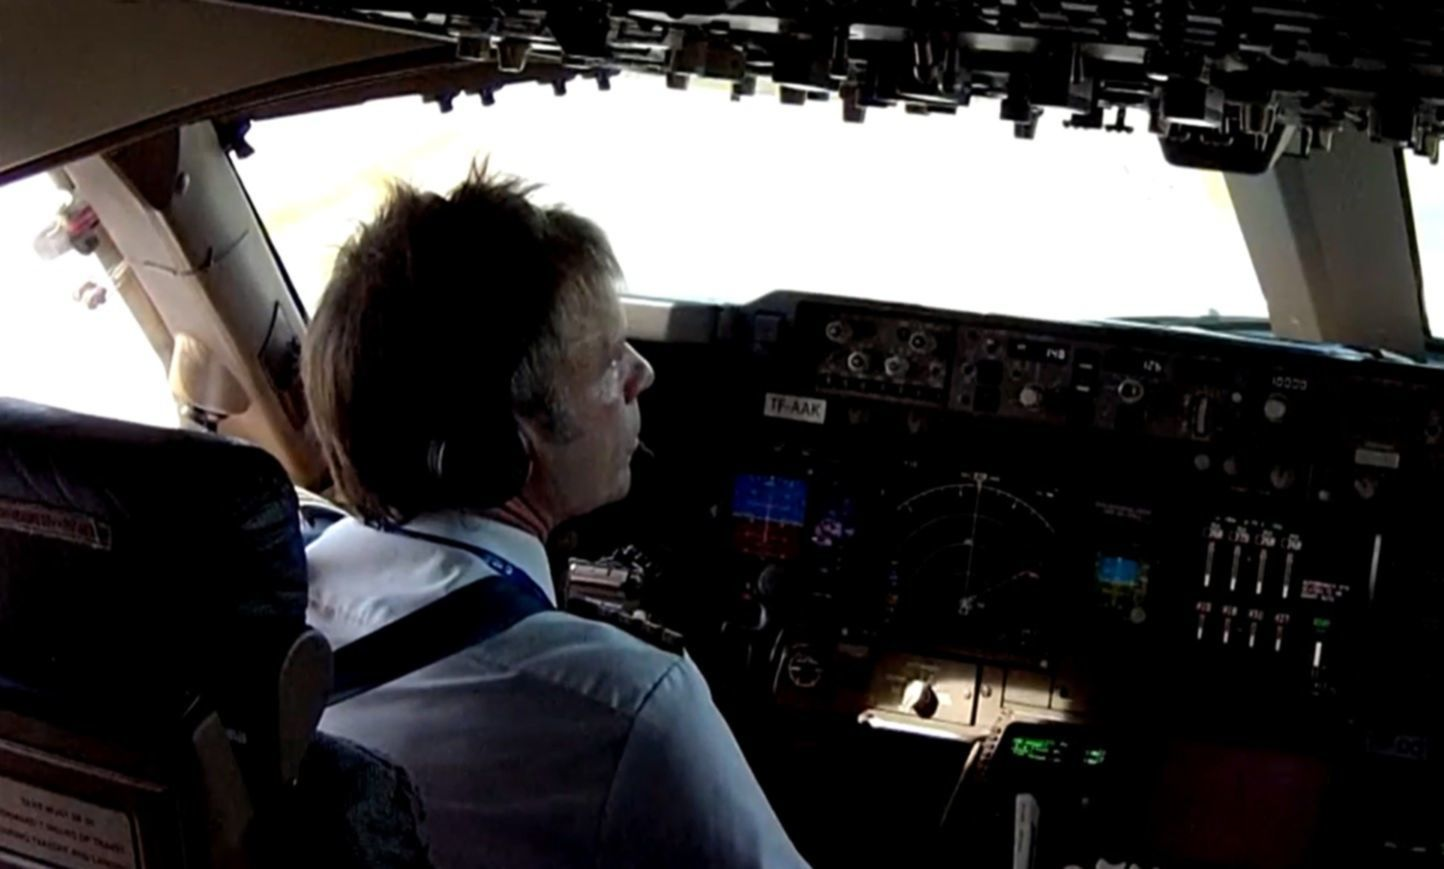 iron maiden bruce dickinson video still cockpit